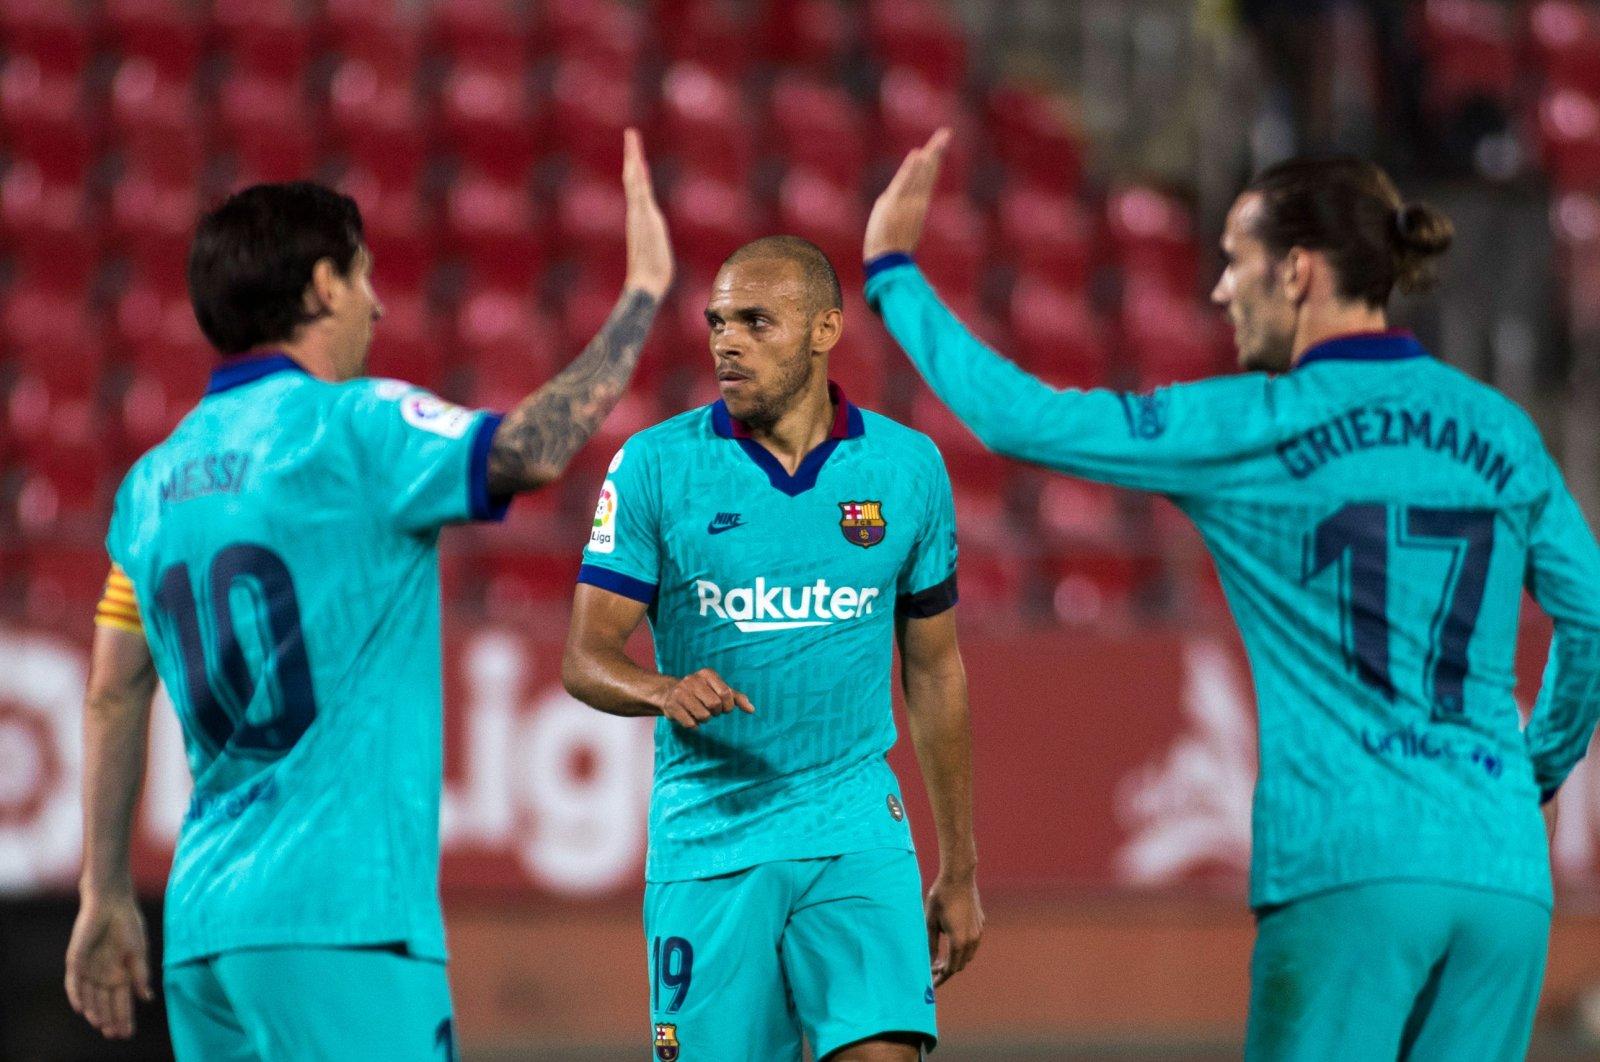 Barcelona's Martin Braithwaite (C) celebrates with Lionel Messi (L) and Antoine Griezmann after scoring a goal against Mallorca, in Palma de Mallorca, Spain, June 13, 2020. (AFP Photo)